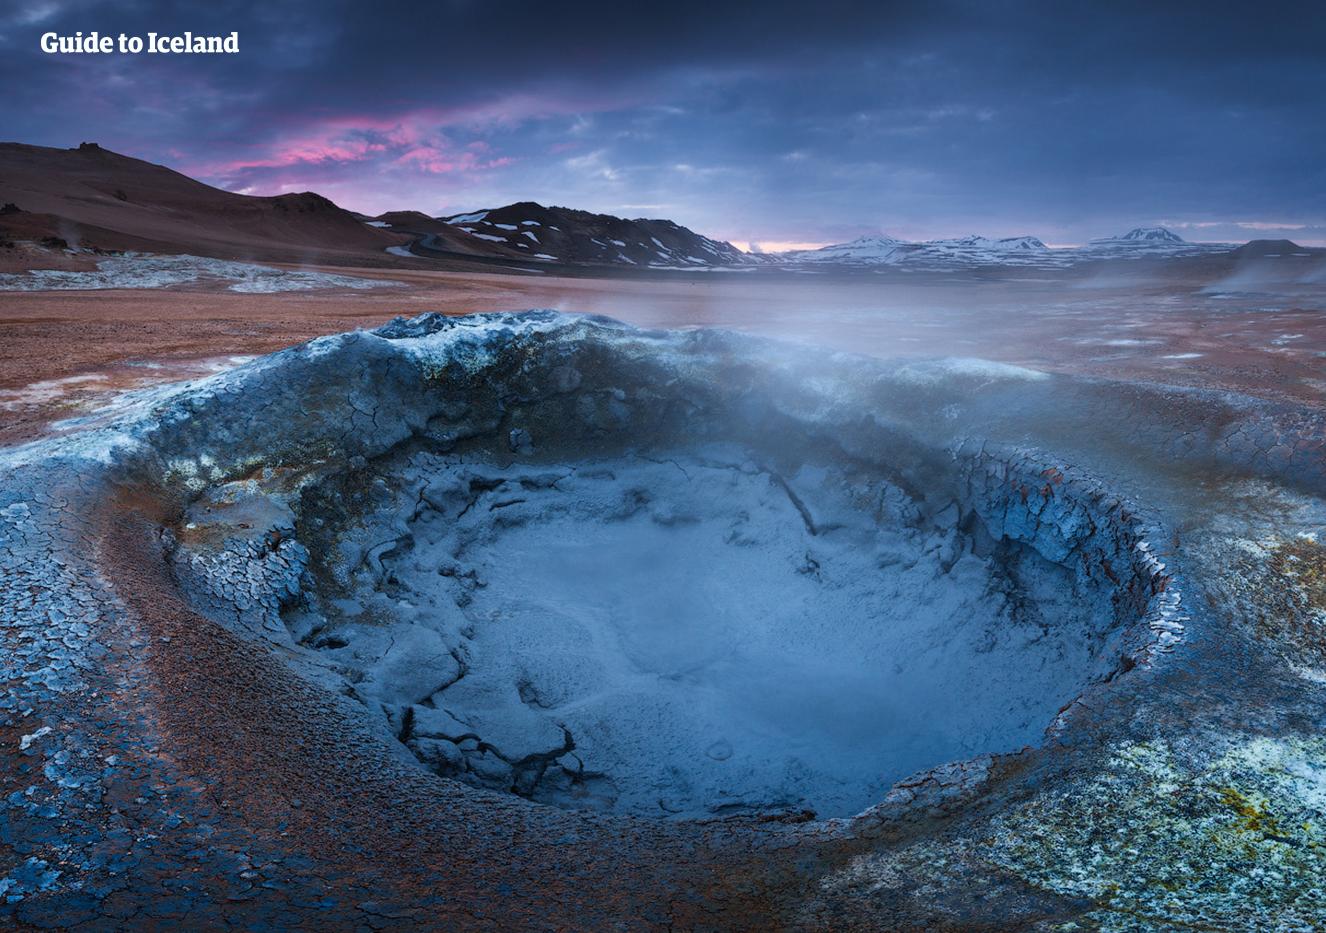 The sulfur heavy, Martian-like landscape of Námaskarð Pass.